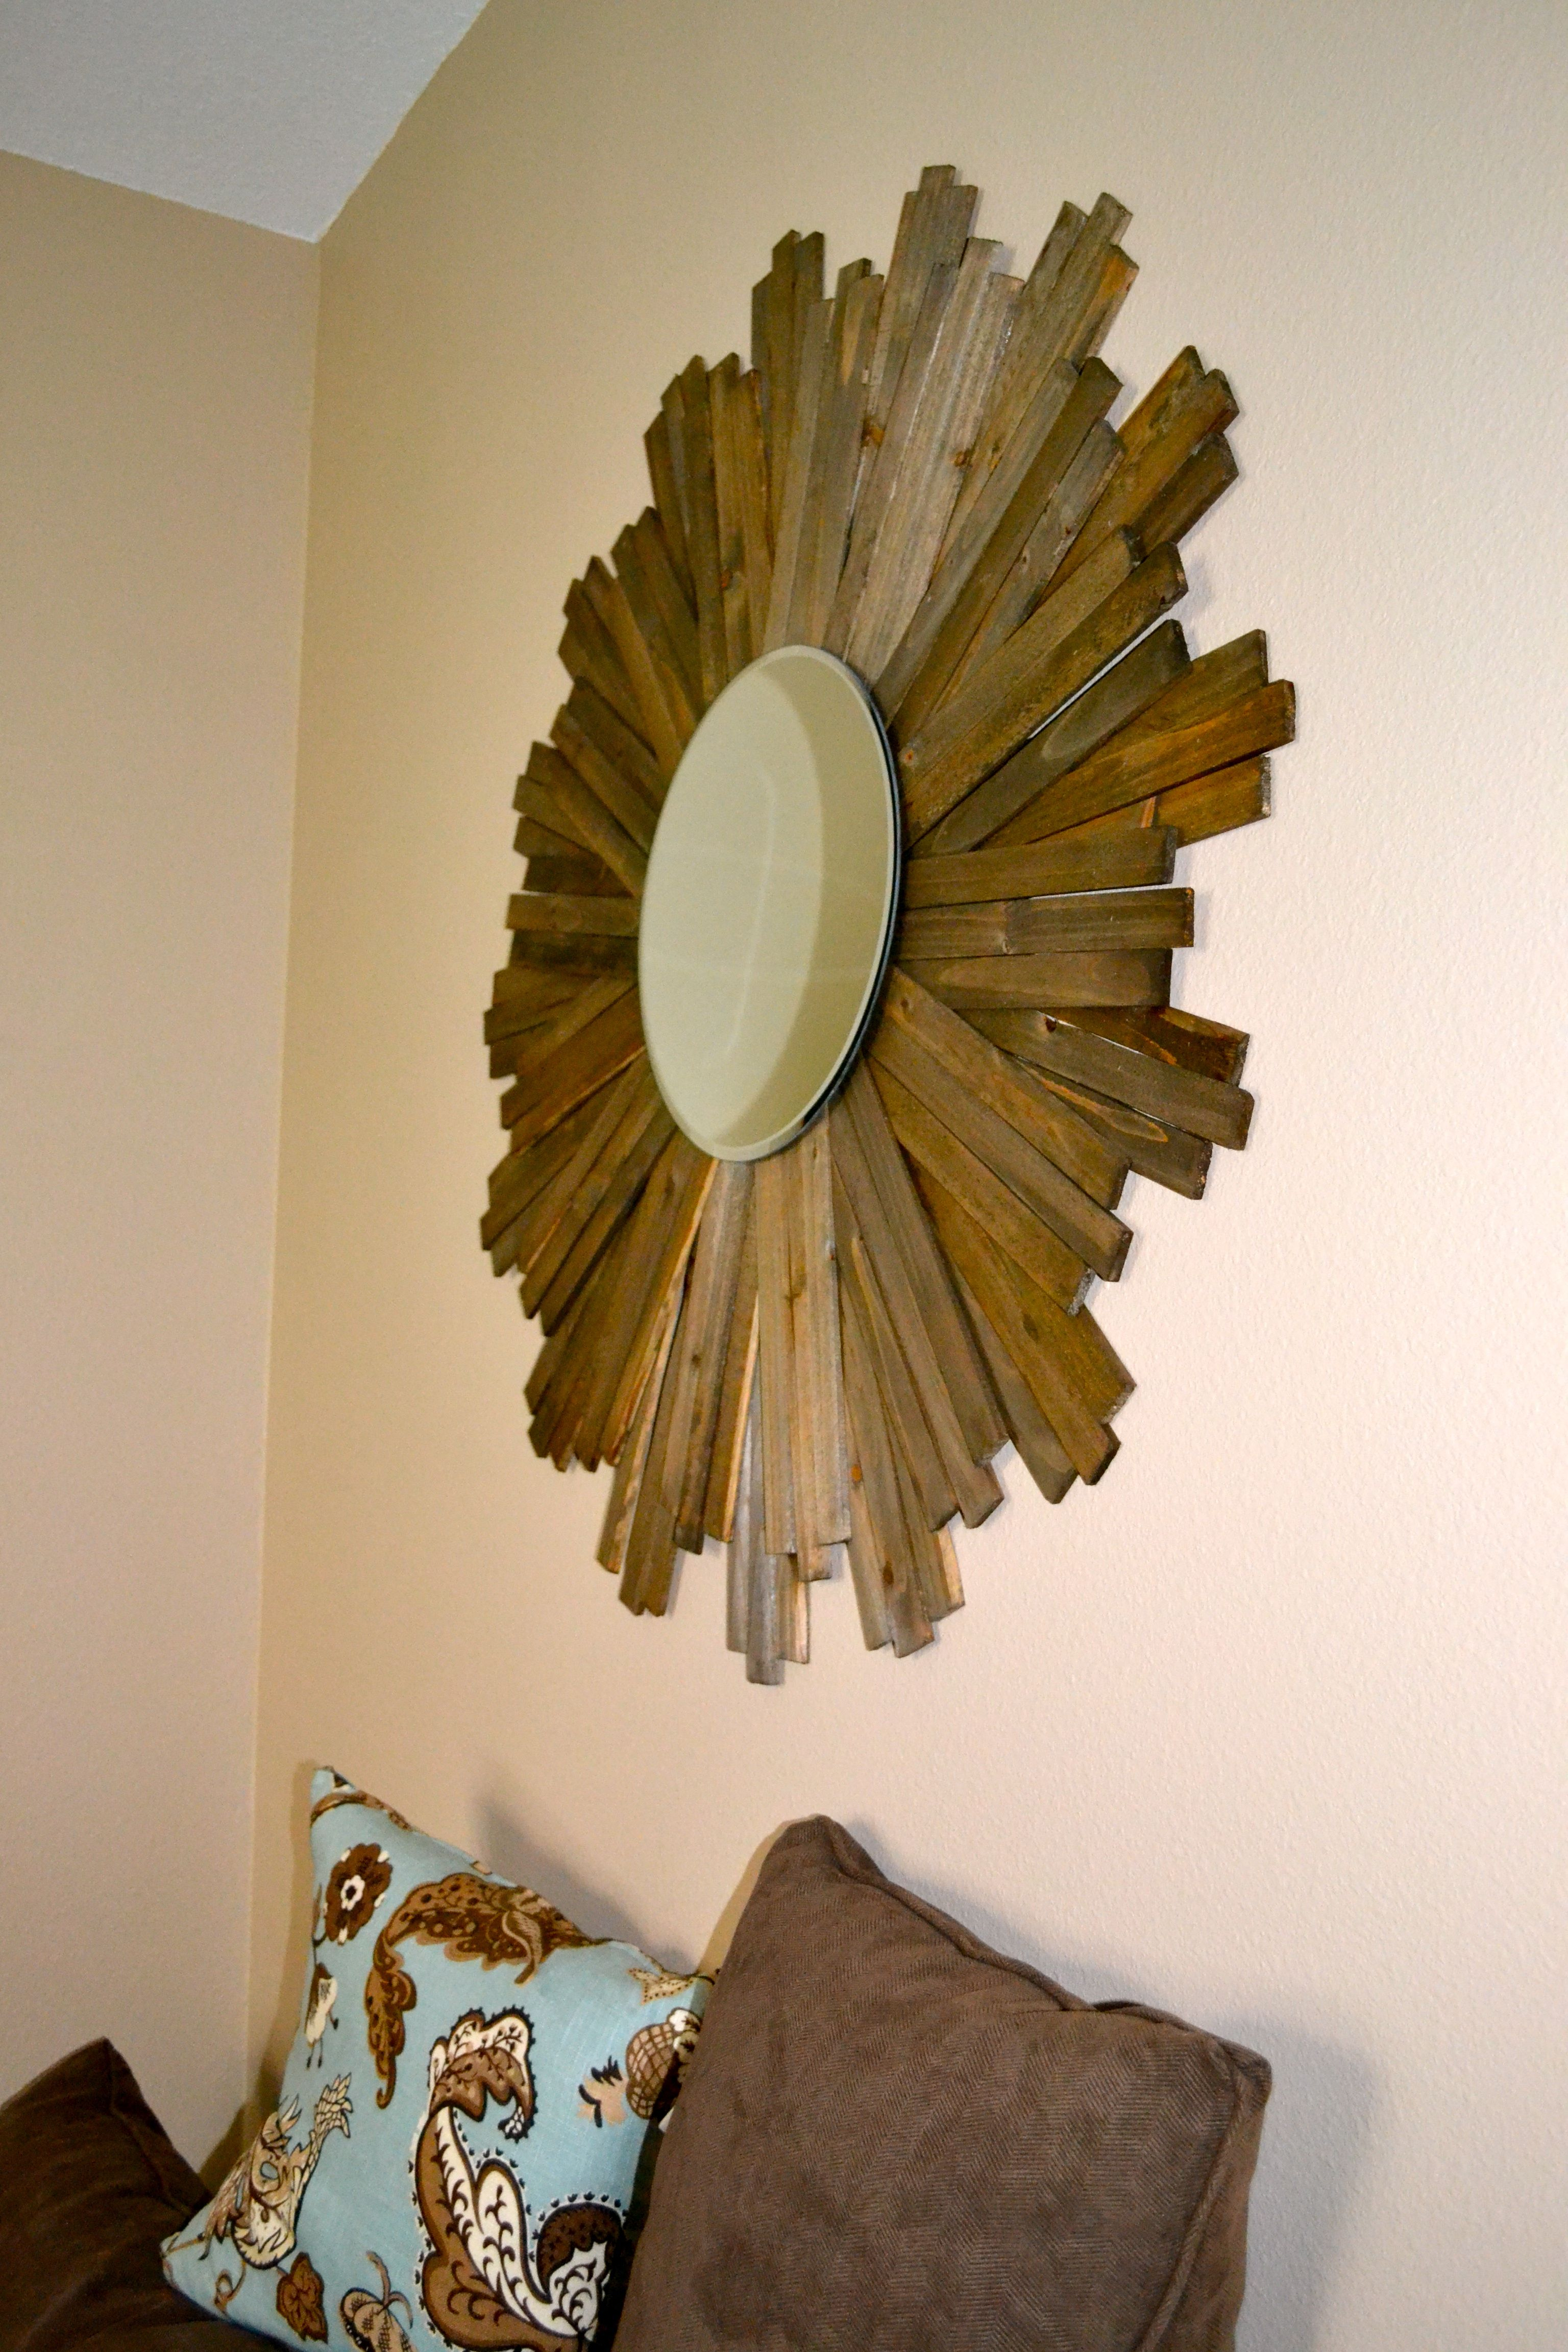 My Diy Sunburst Mirror I Used Wood Shims From Home Depot Diy